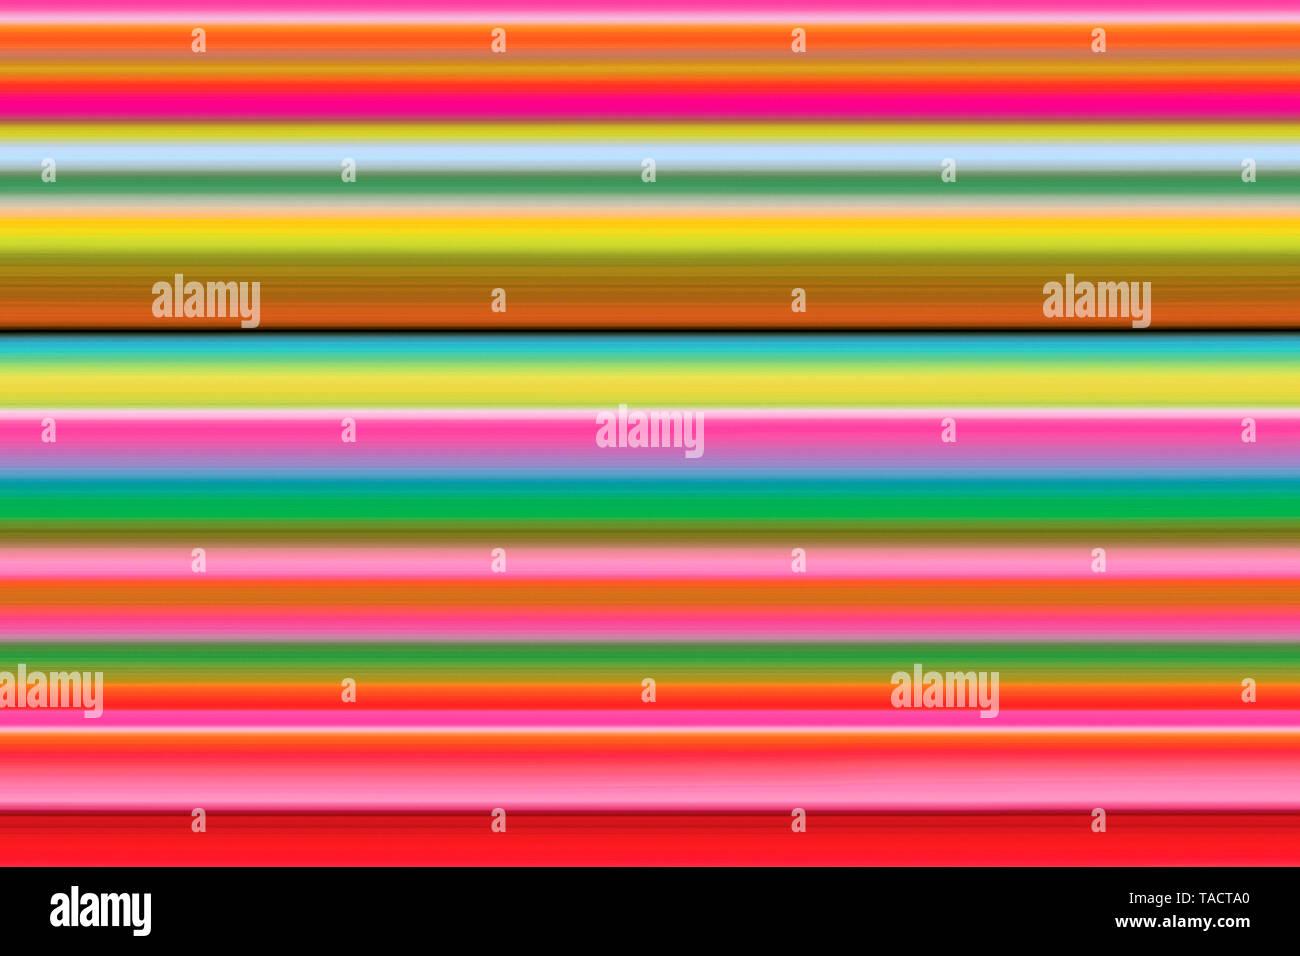 Modern fine art computer digital paintings creative hypnotist imagination colourful line vhm 11/11/2014. - Stock Image